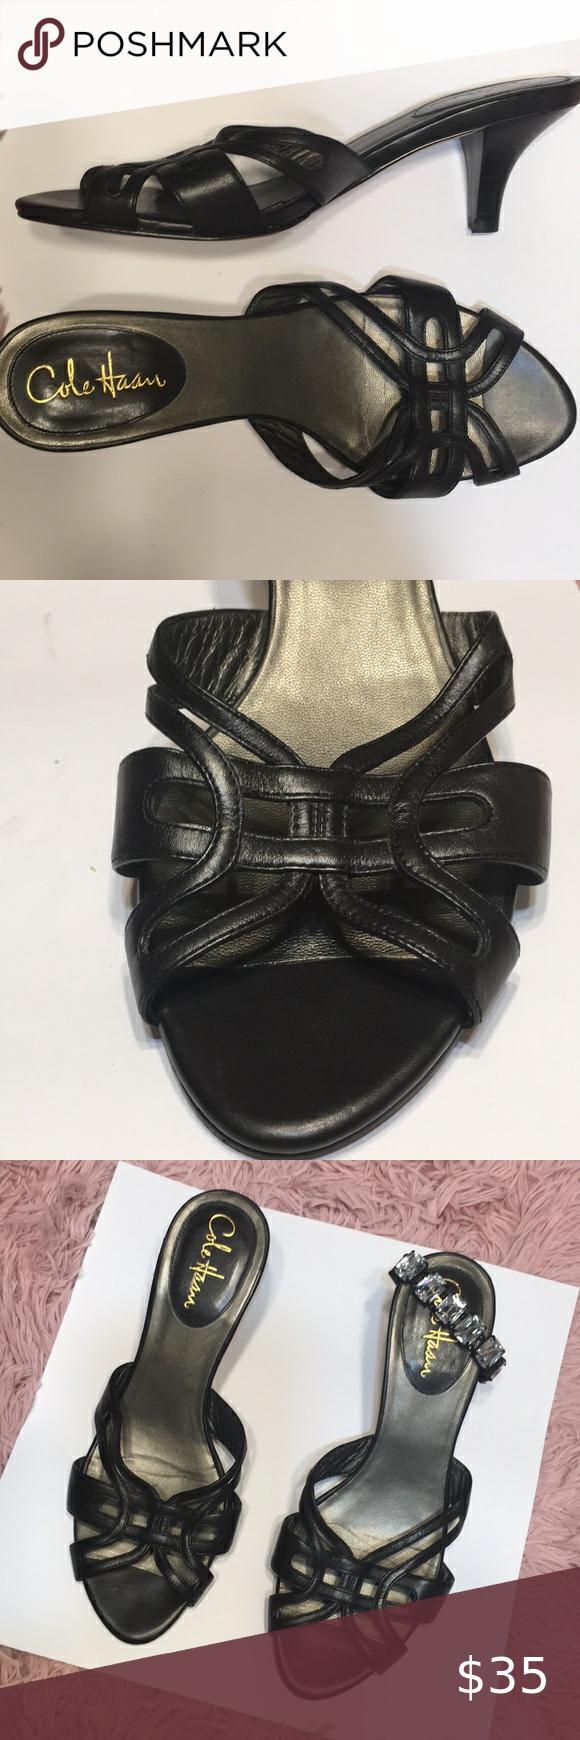 Black Kitten Heel Shoe Cole Haan Nike Air Size 9 In 2020 Black Kitten Heels Kitten Heel Shoes Kitten Heels